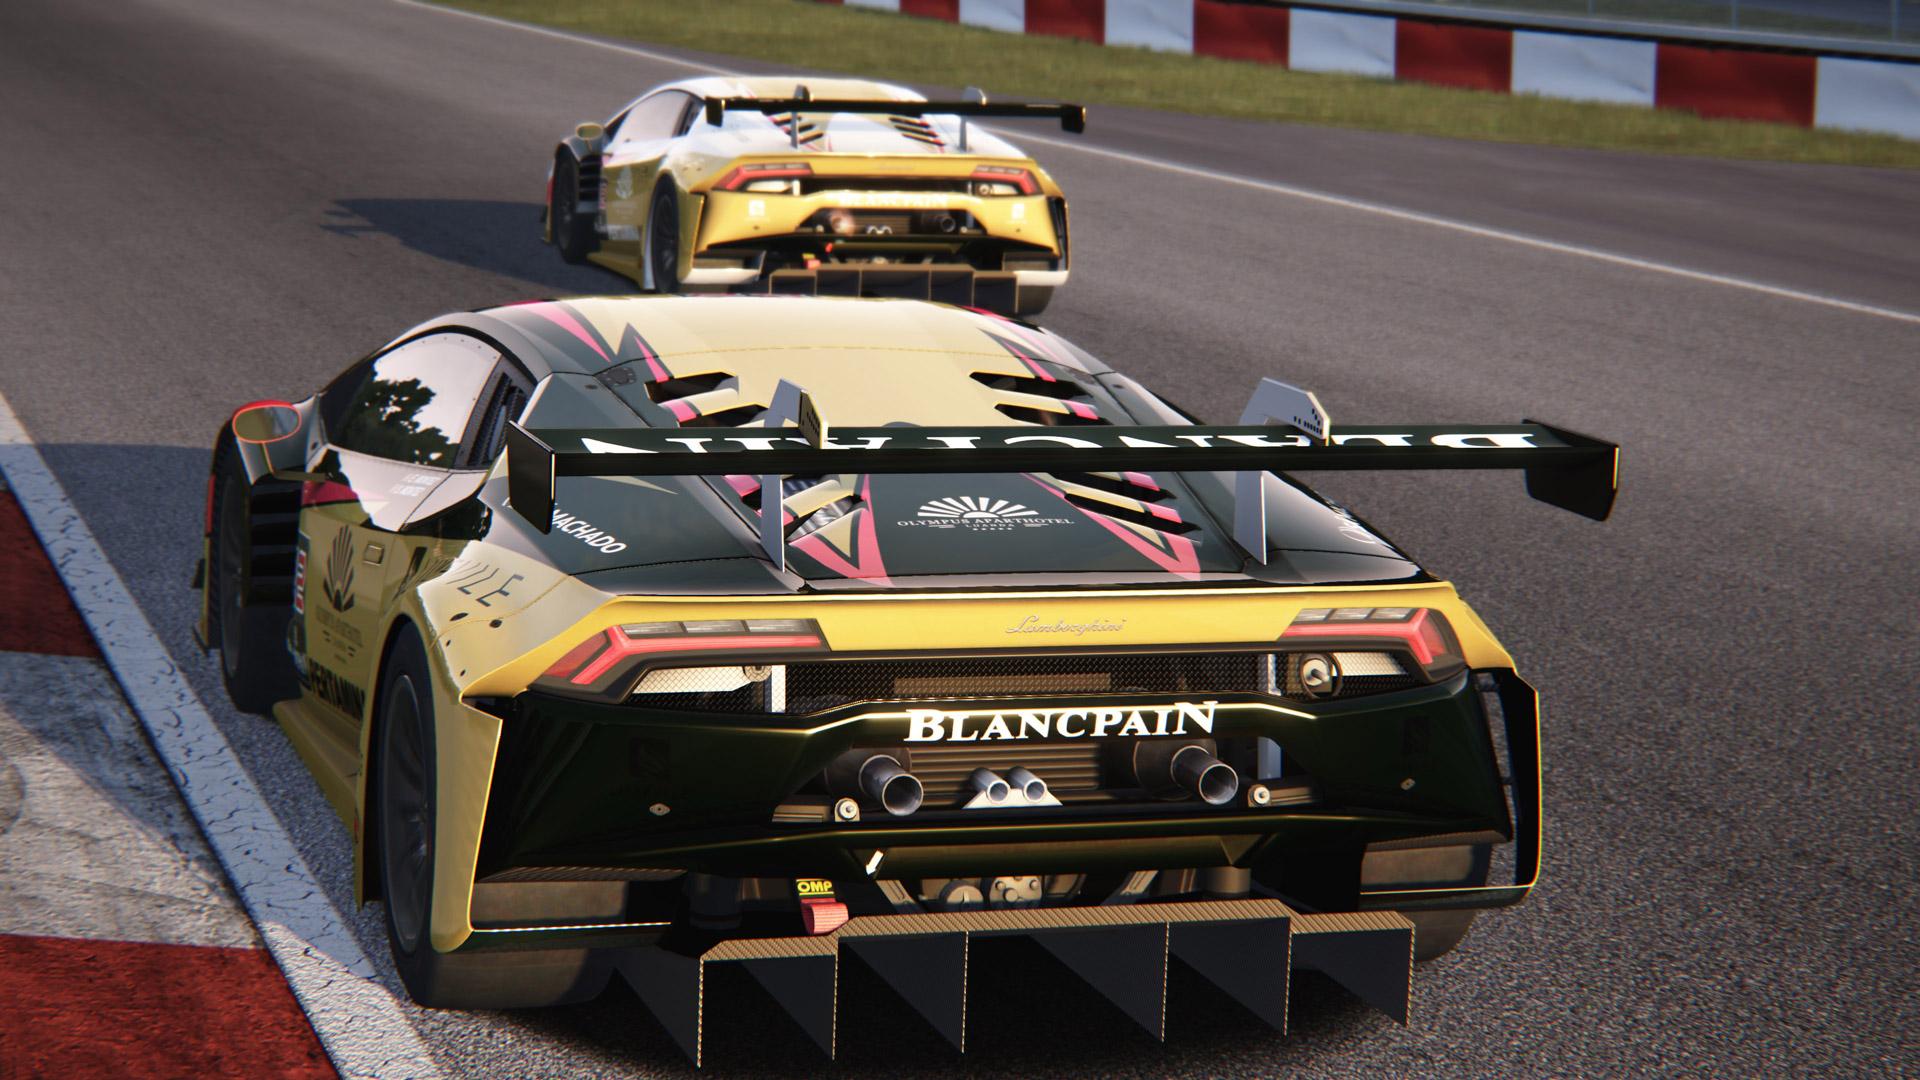 Screenshot_ks_lamborghini_huracan_gt3_nurburgring-sprint_20-10-115-0-53-9.jpg